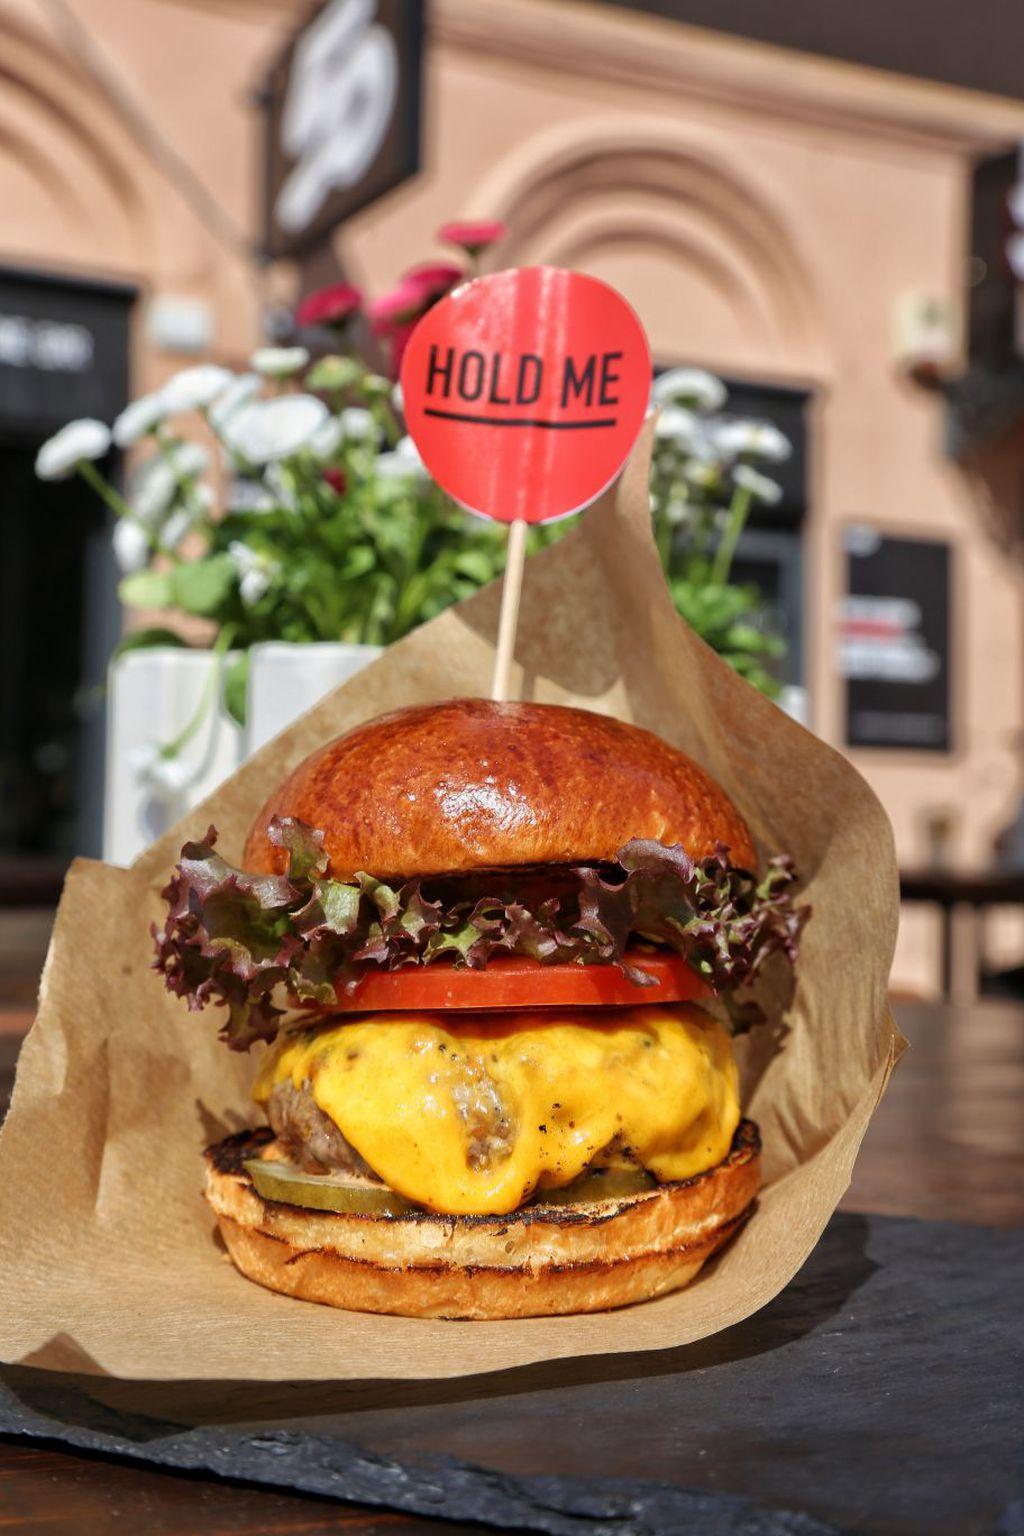 Sočni burger